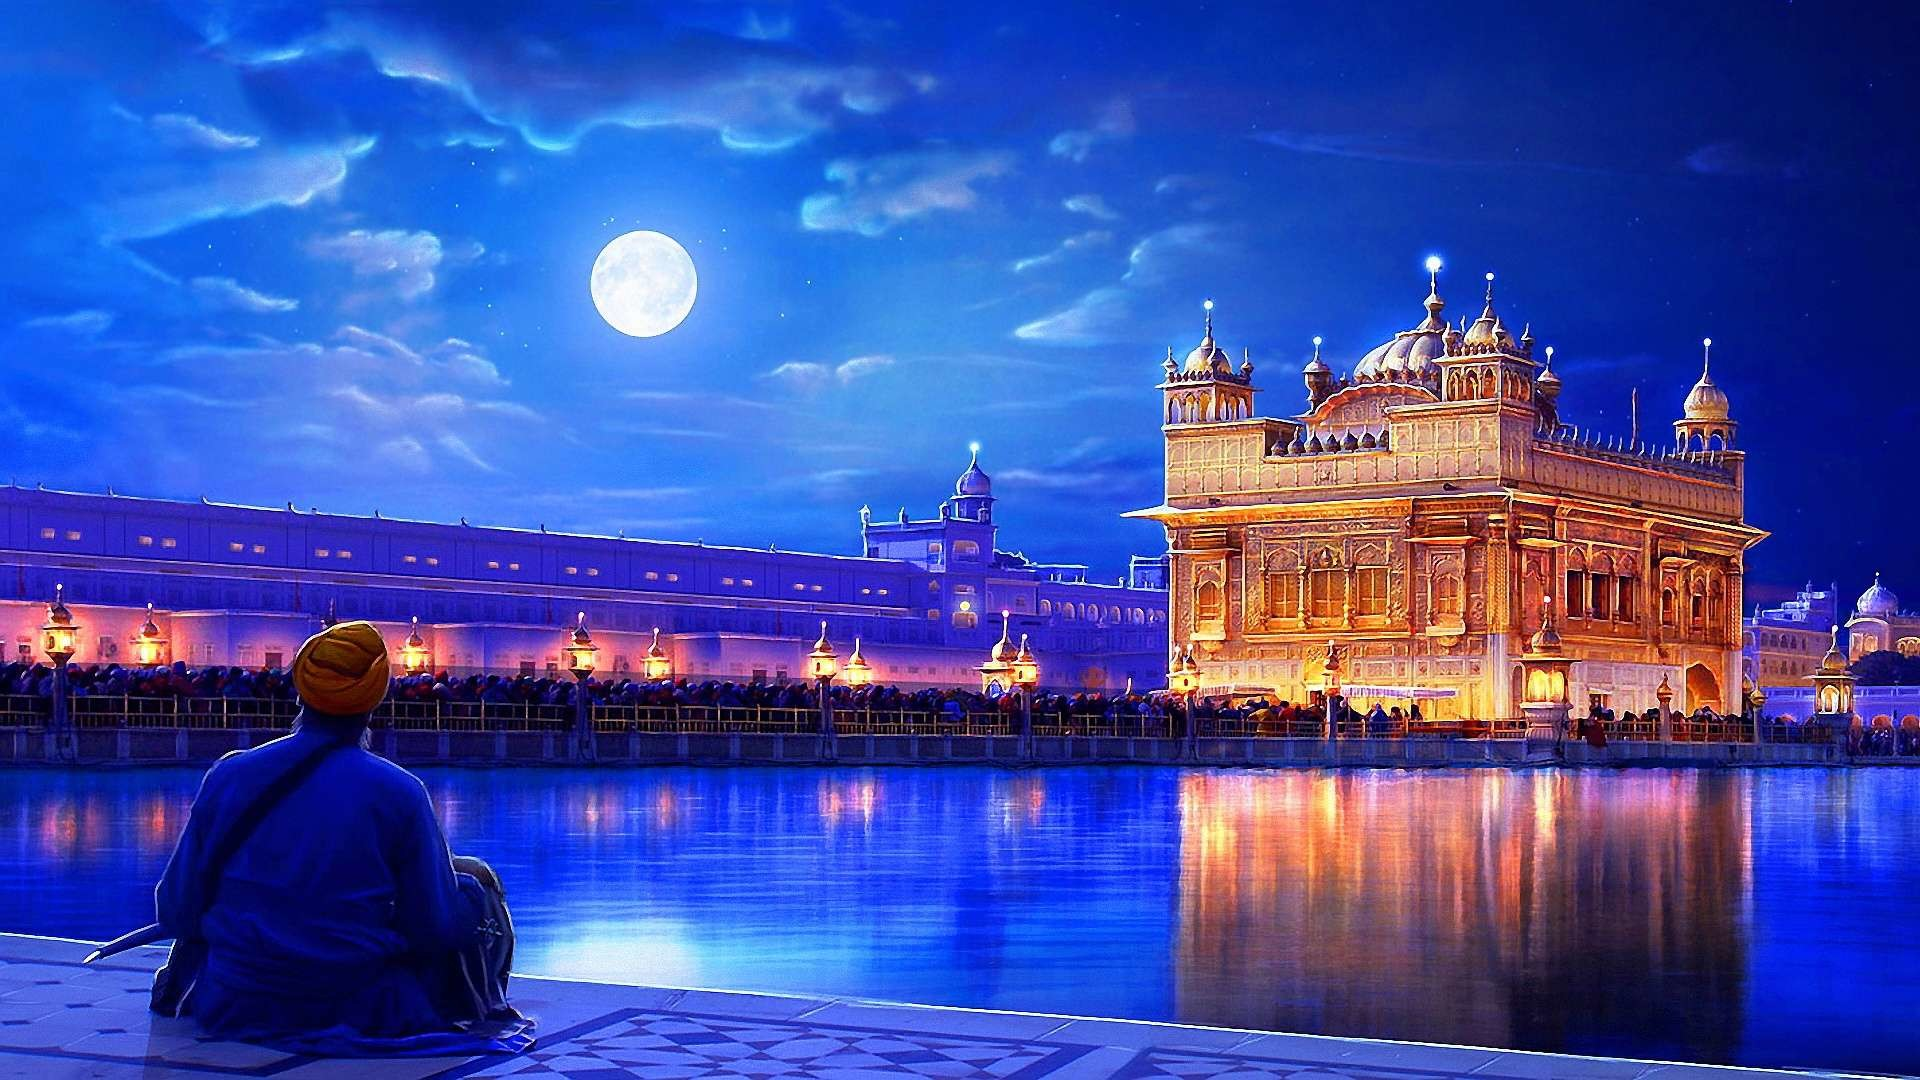 Taj Mahal Pictures Scenic Travel Photos: Taj Mahal At Night Wallpaper